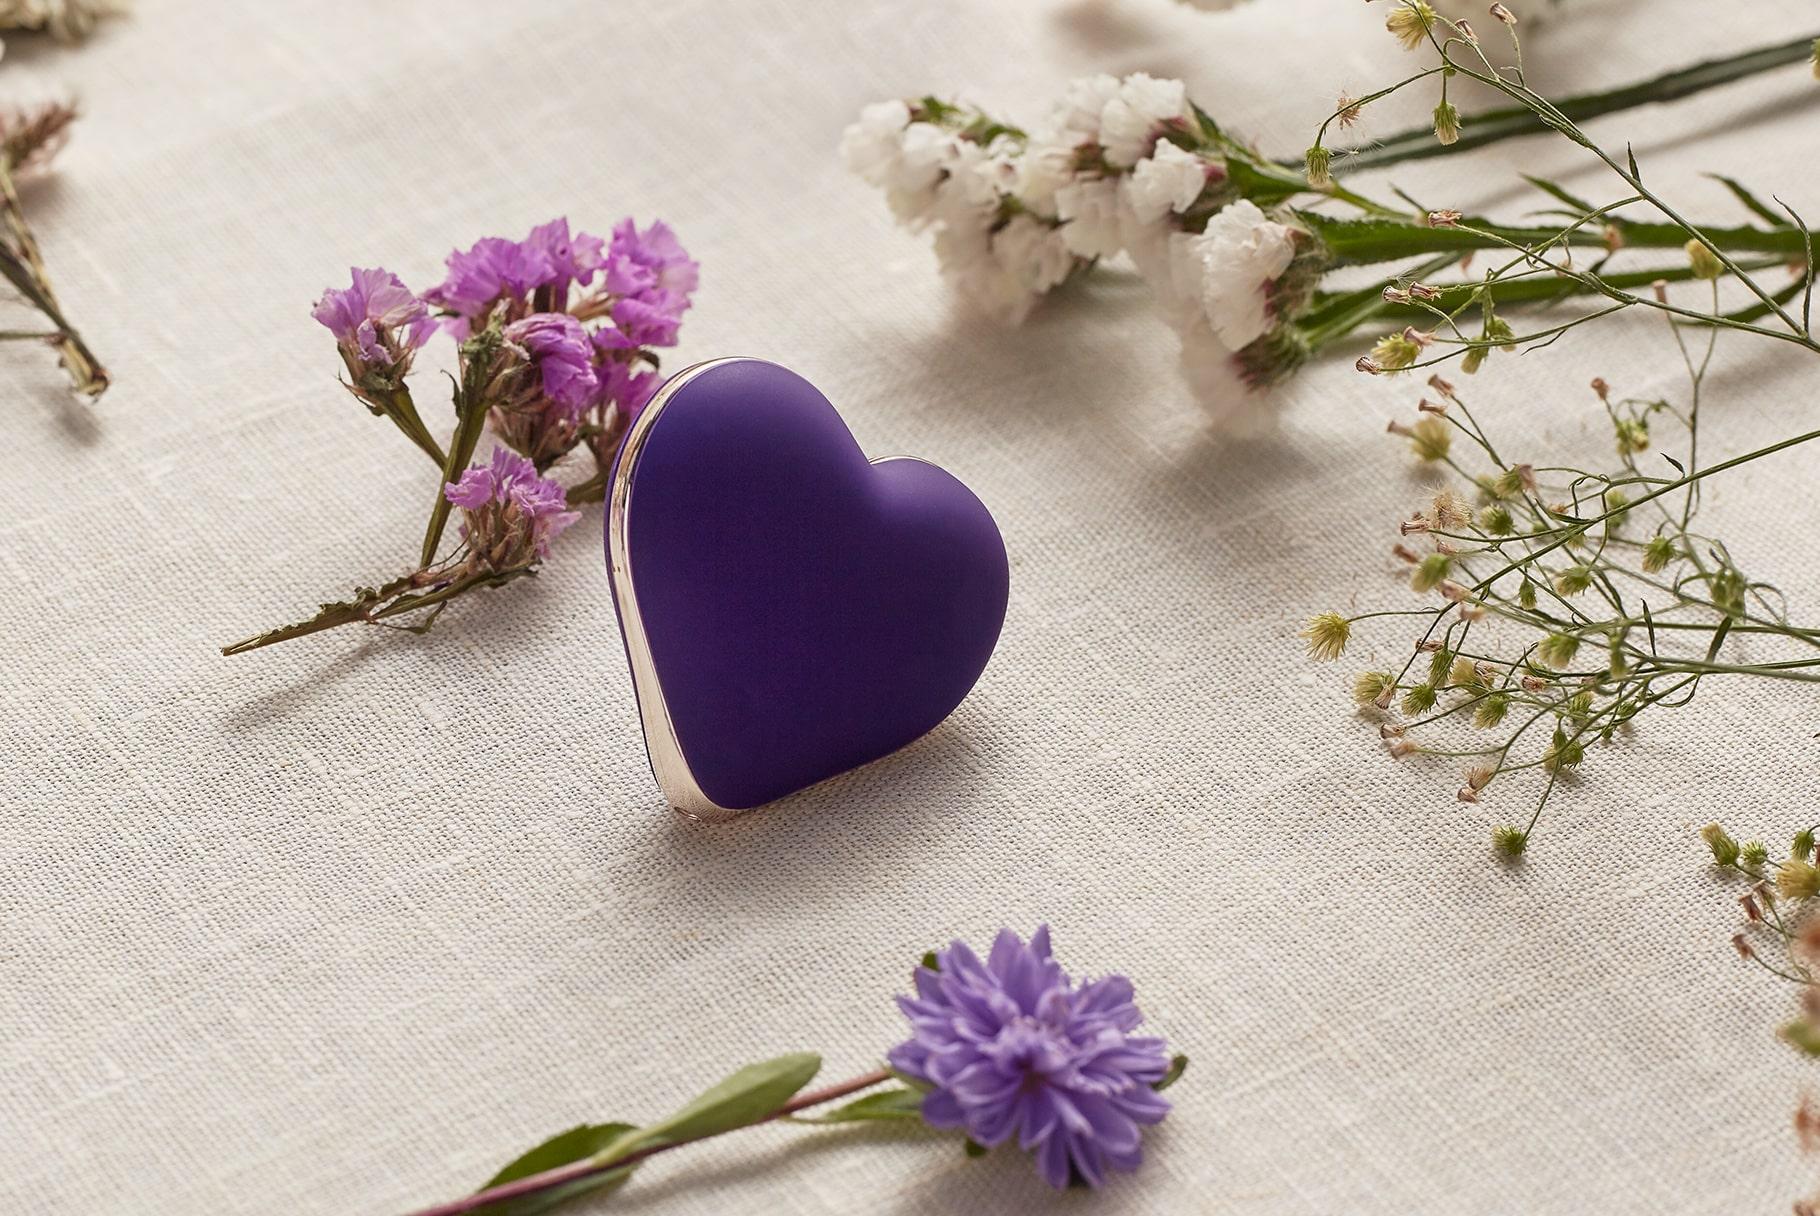 rianne s heart vibe wibrujace serduszko masazery lechtaczki